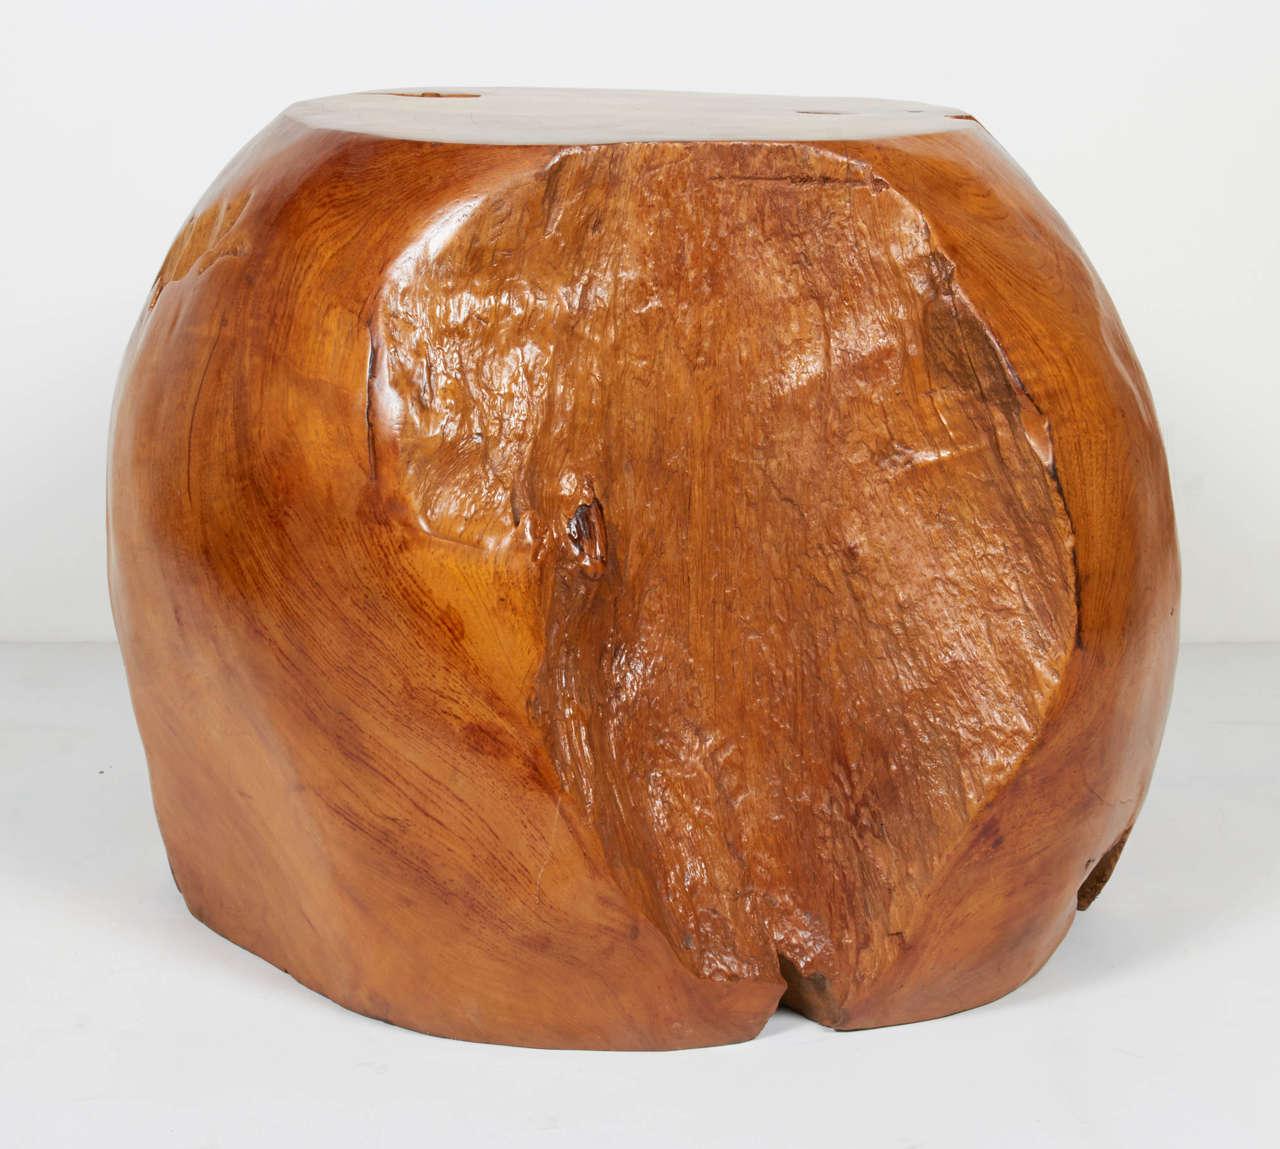 Organic teak wood spherical side table or stool at stdibs